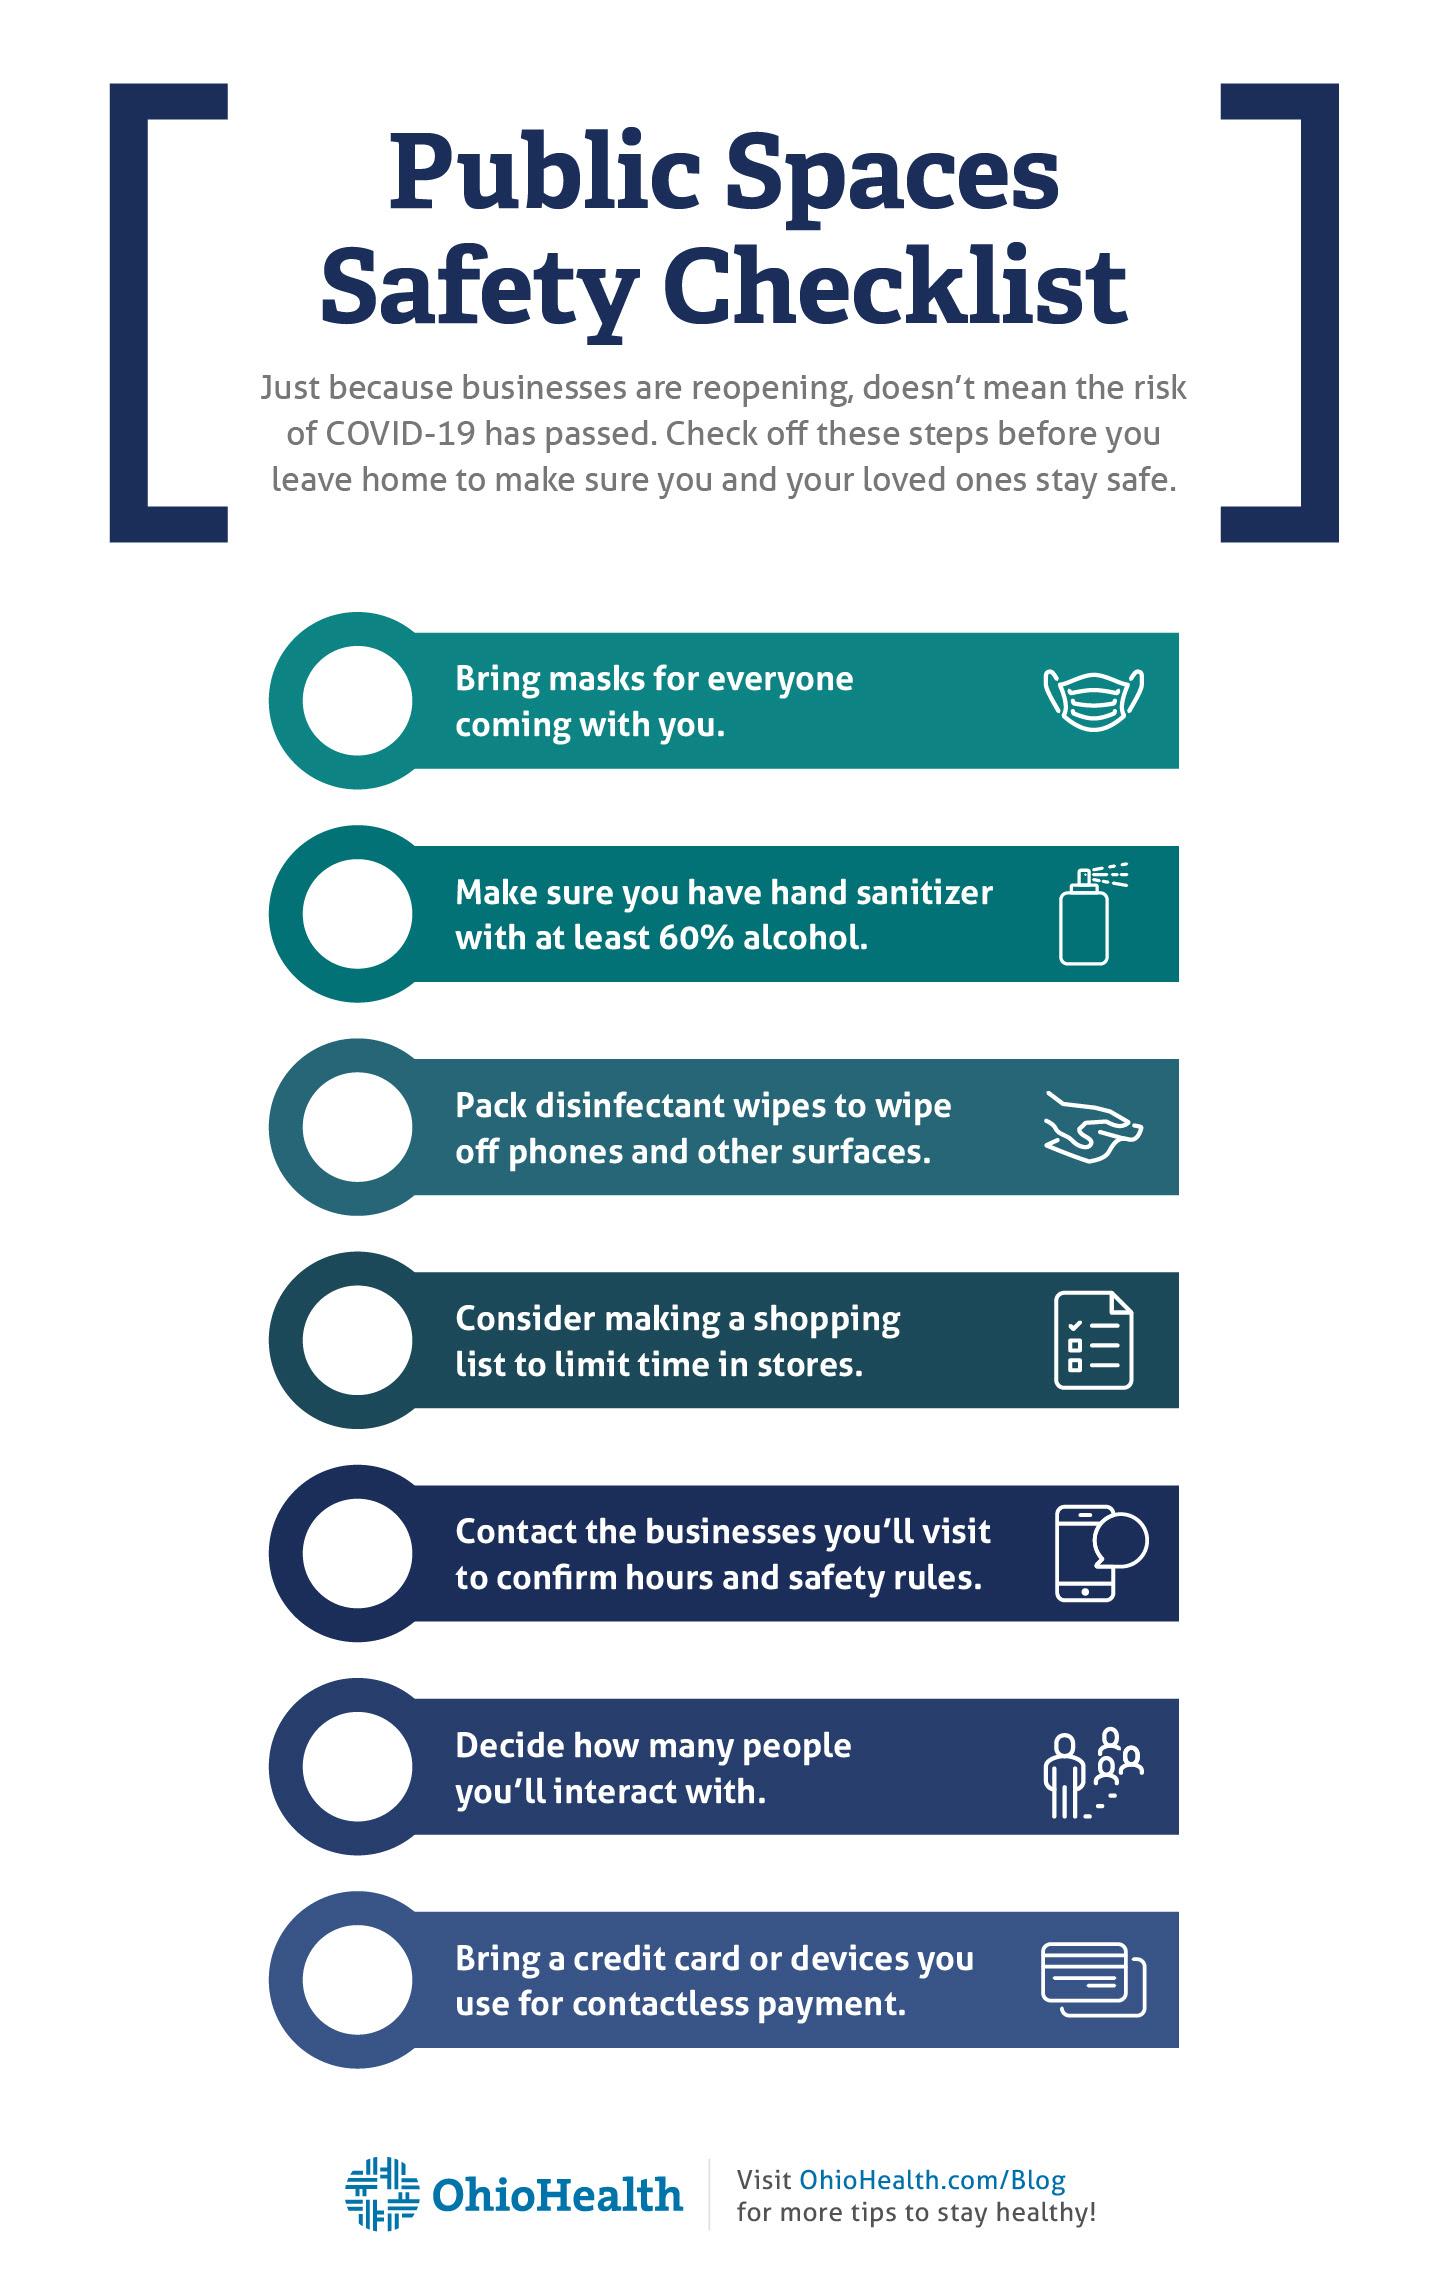 COVID-19: Family Safety Checklist - OhioHealth